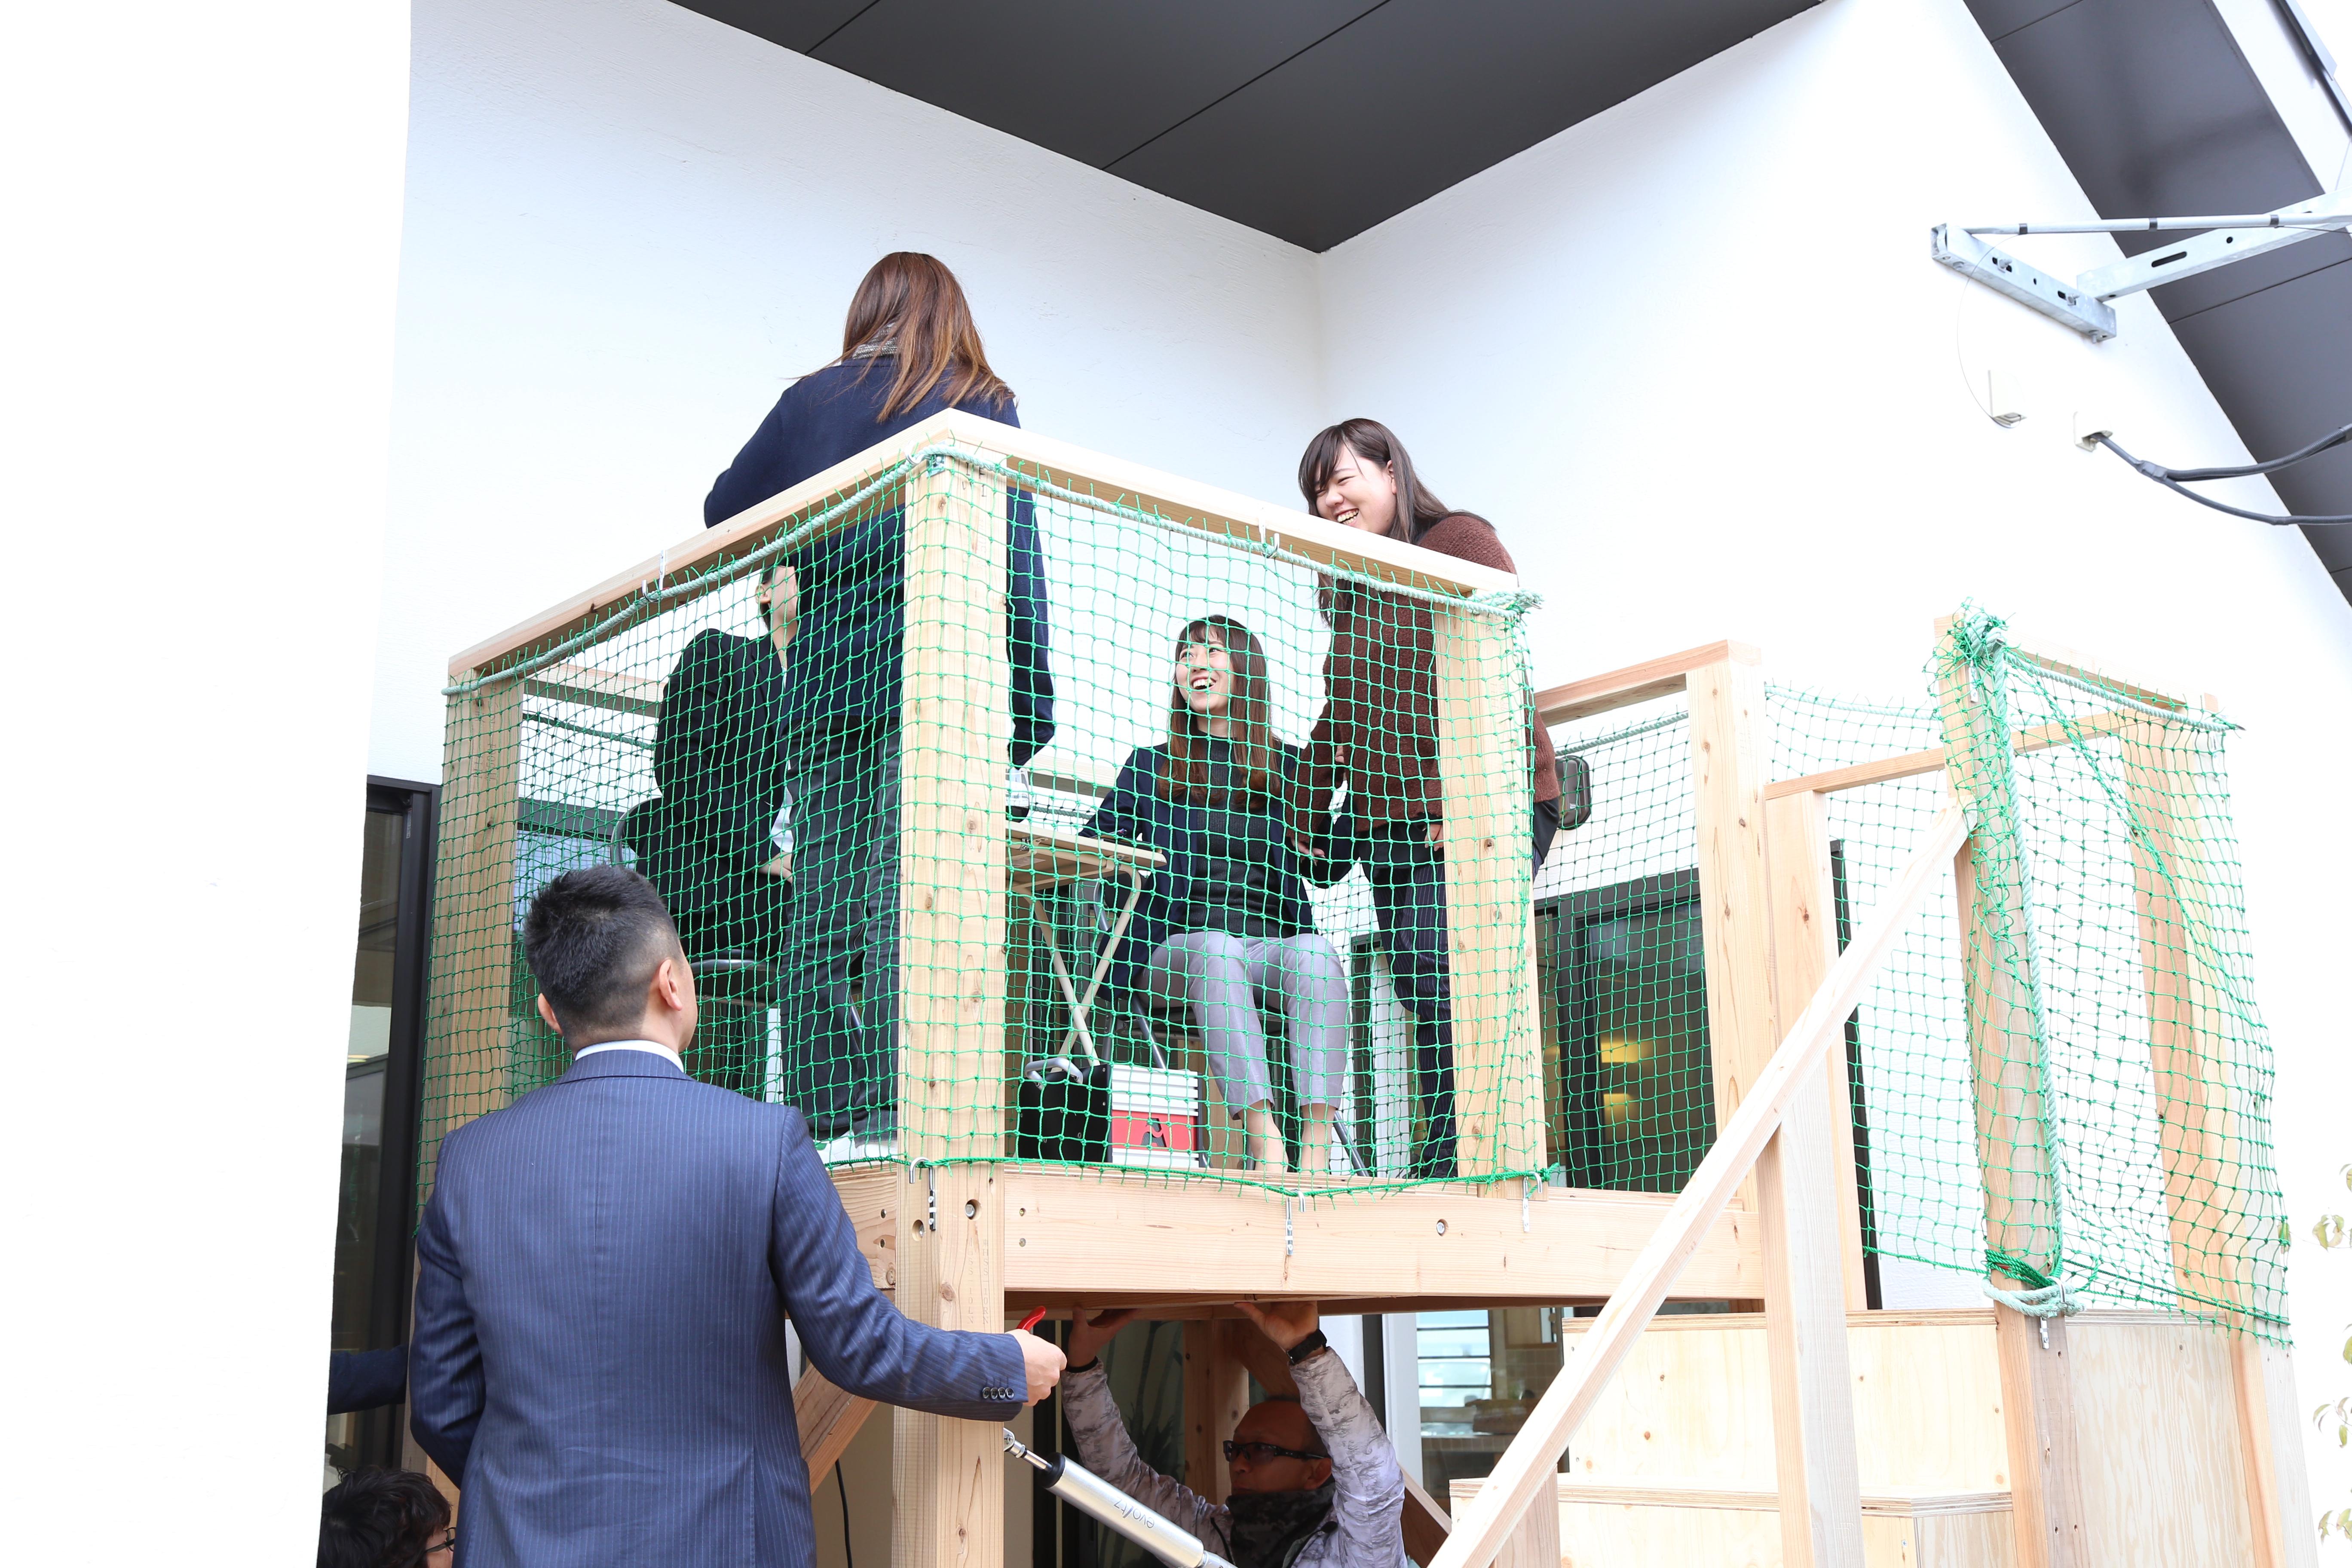 大分県初総合住宅展示場の敷地内に「地震対策制振体感棟」常設設置|坂井建設プレスリリース